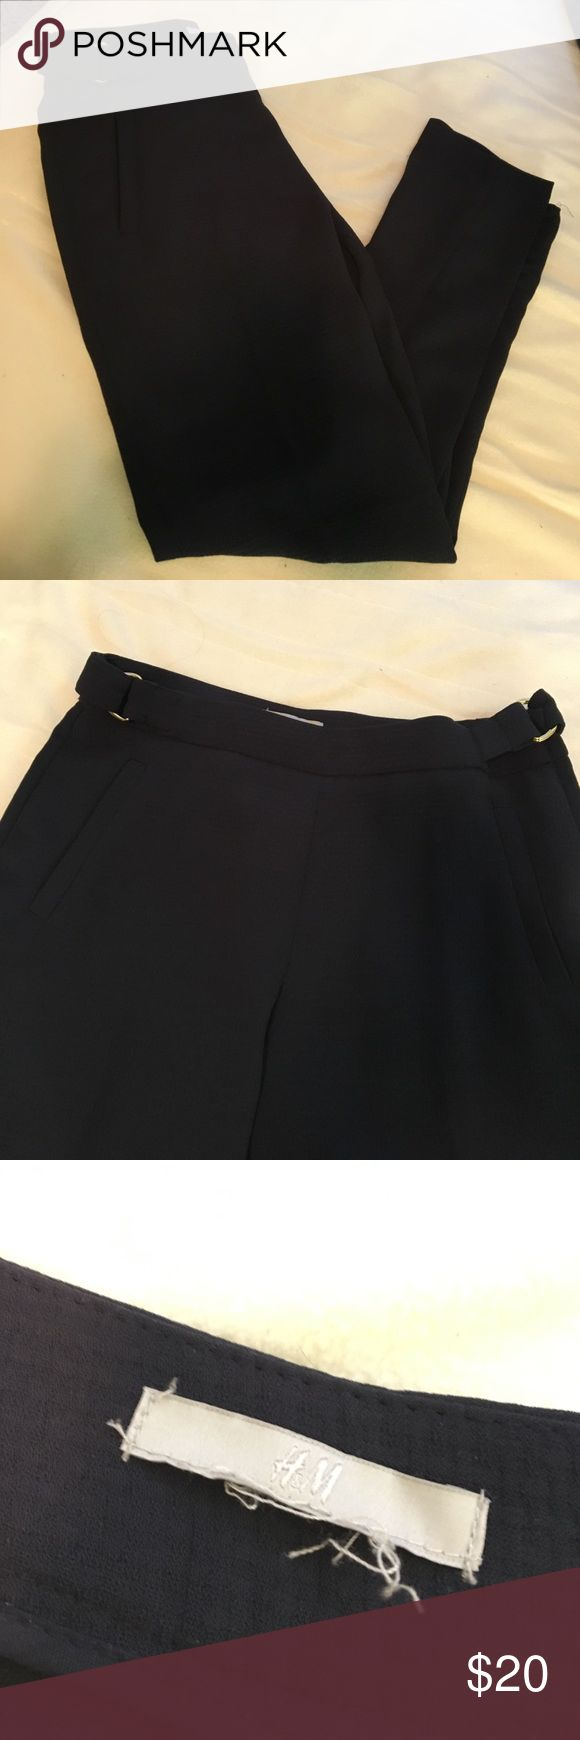 Navy blue dress pants NWOT H&M NWOT navy blue dress pants. So comfy and so cute!! H&M Pants Trousers